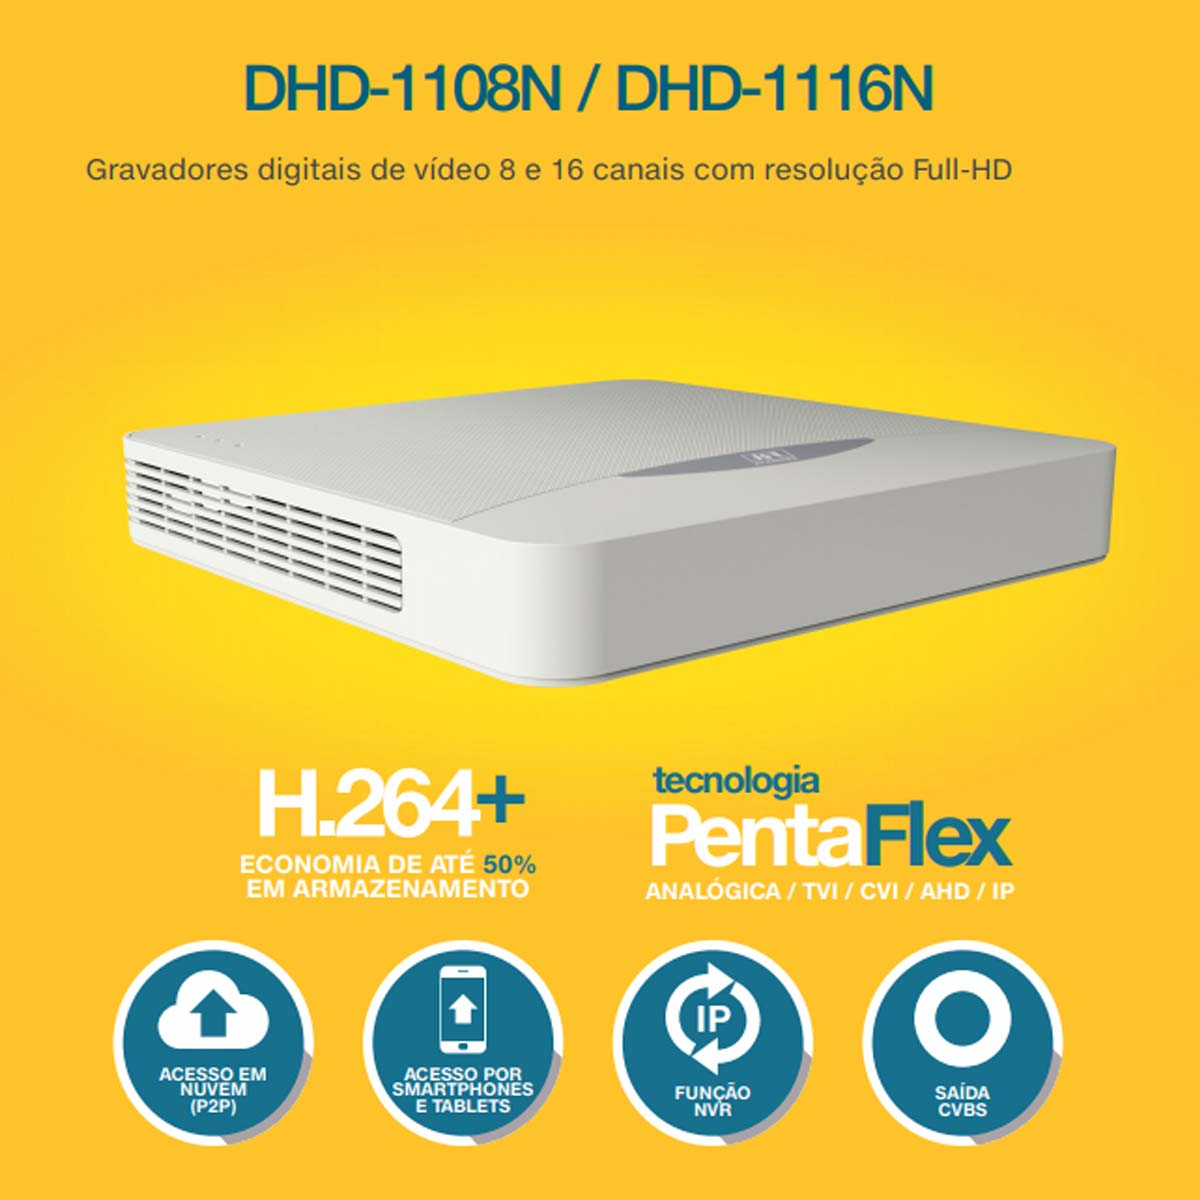 DVR STAND ALONE DHD 1116N  16CH 02050045 - JFL